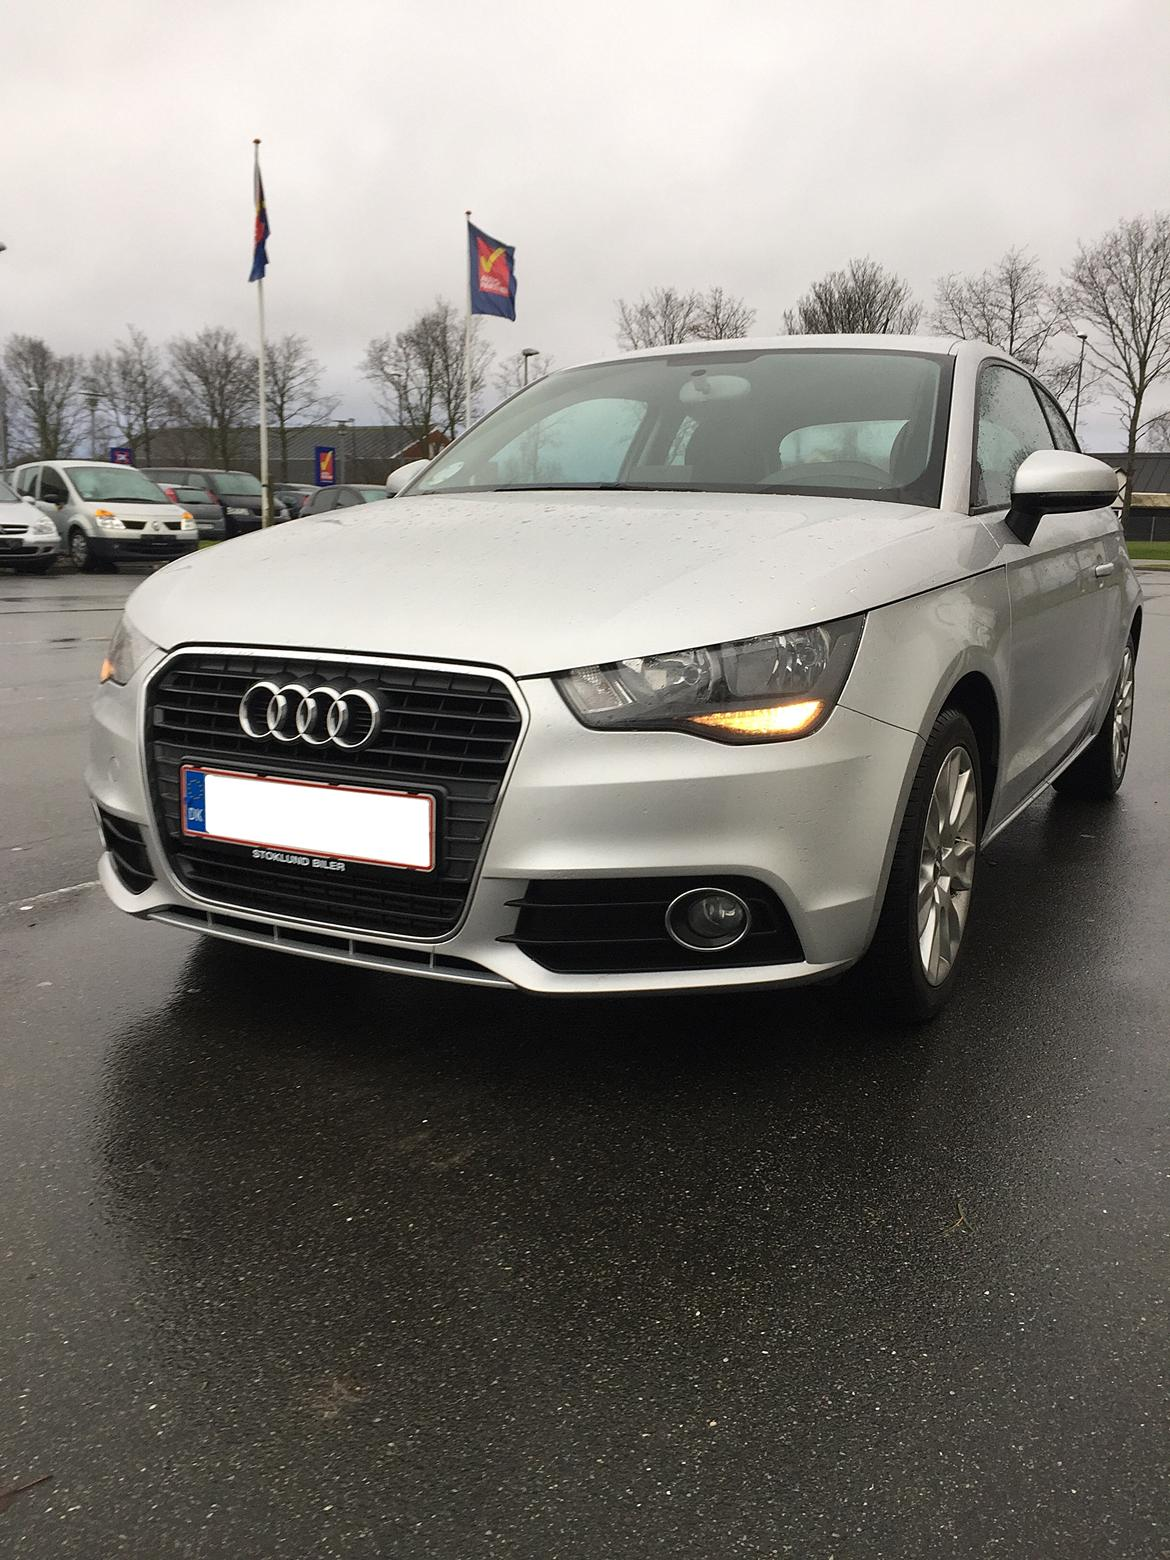 Audi A1 Ambition billede 2